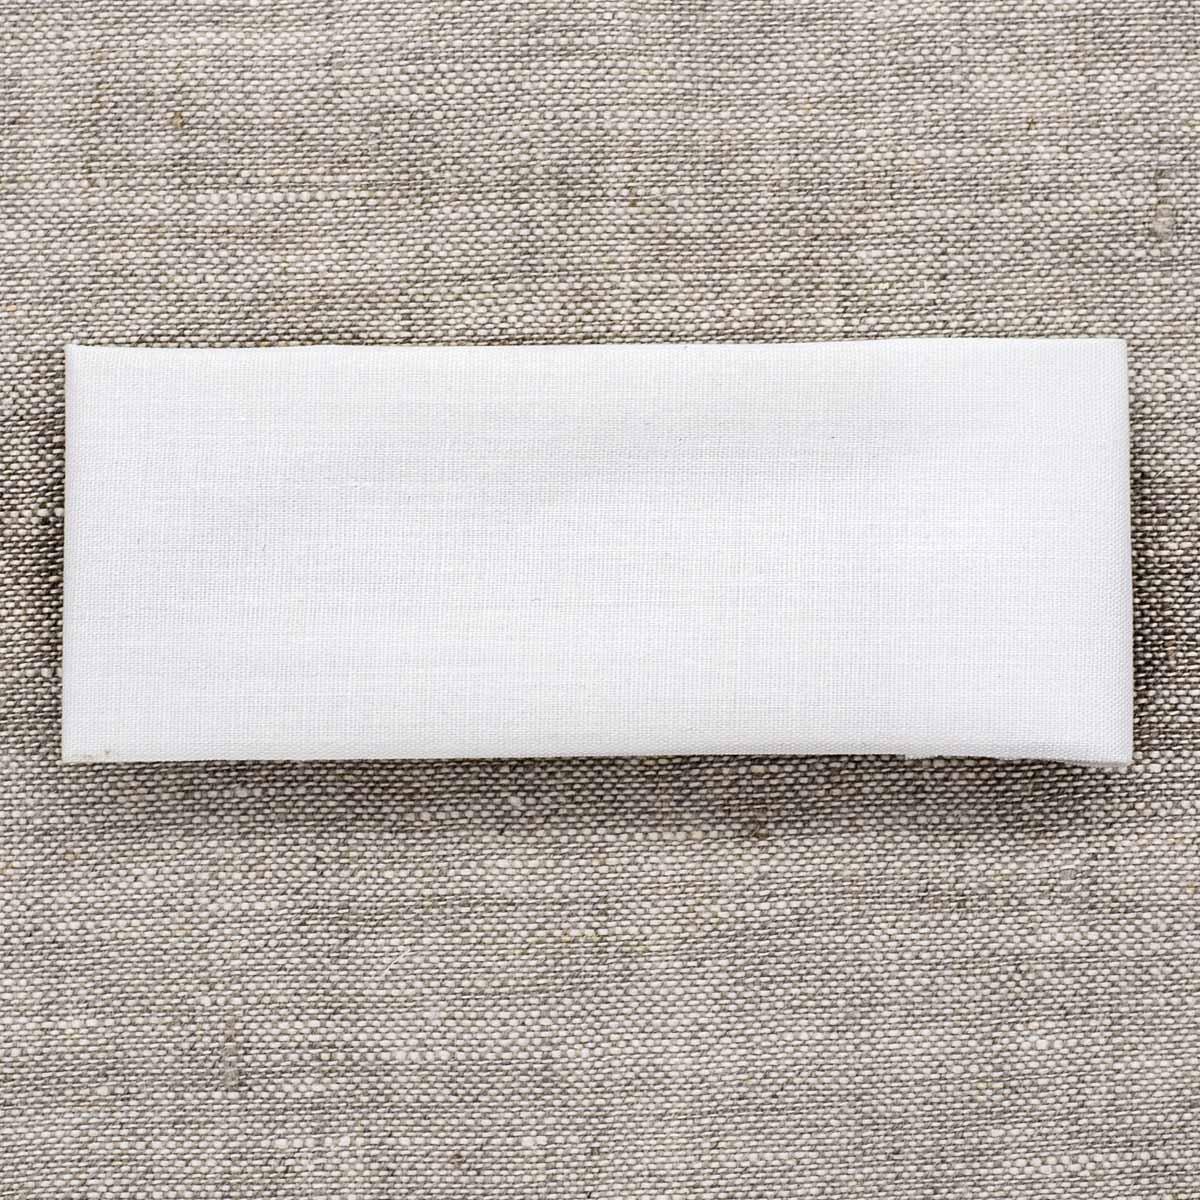 Ткань для заплаток, 27см*7,5см, белая 810250, Hobby&Pro